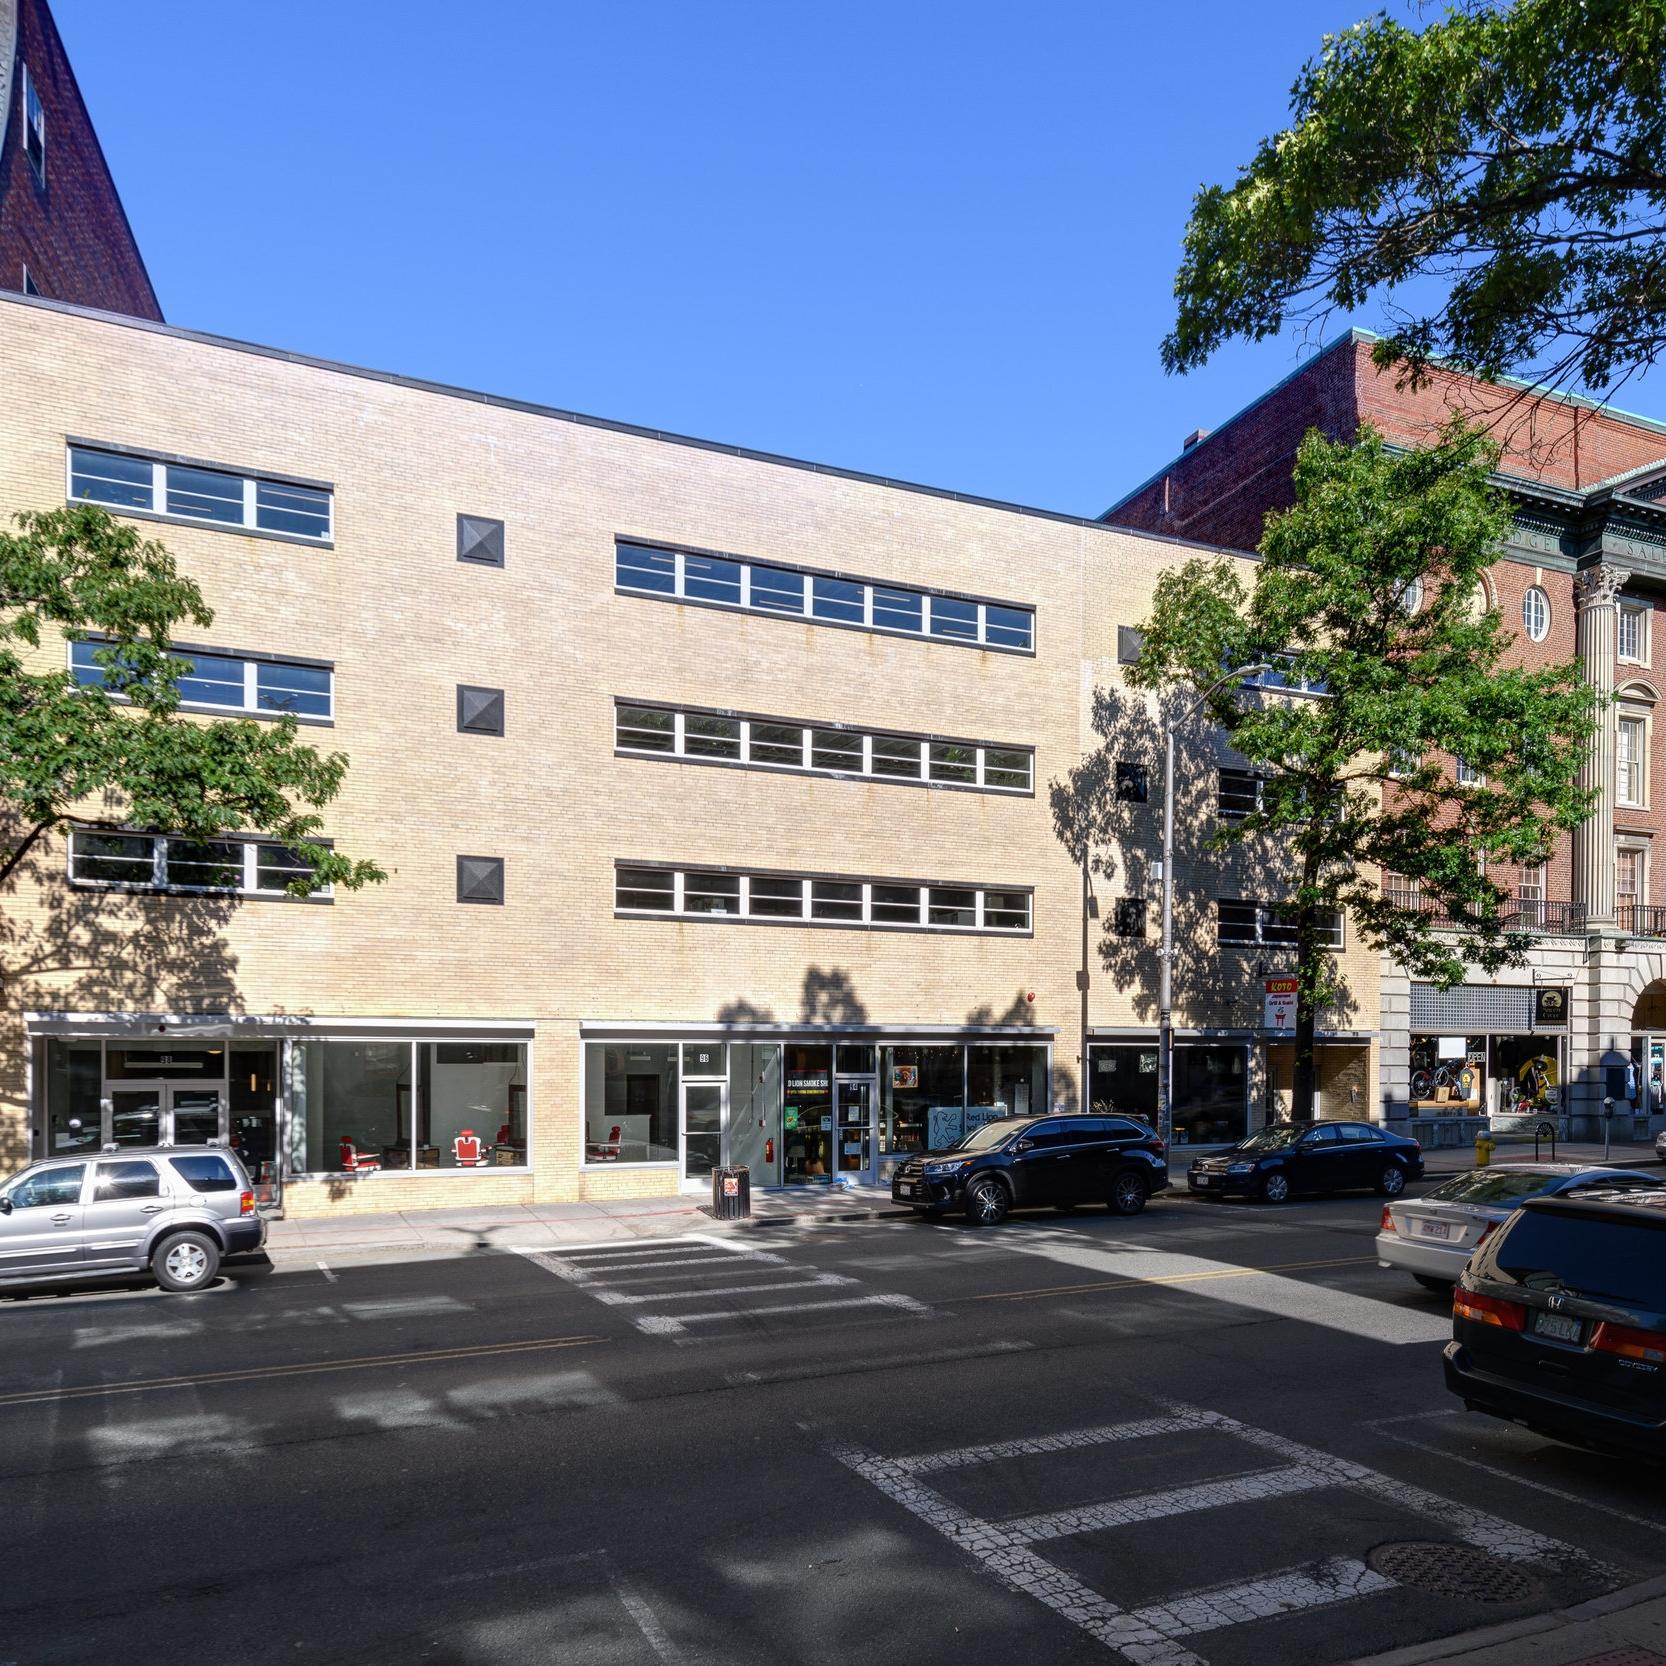 nineZERO Washington   90 Washington Street Salem, MA Contractor: Jewett Construction Architect: Winter Street Architects